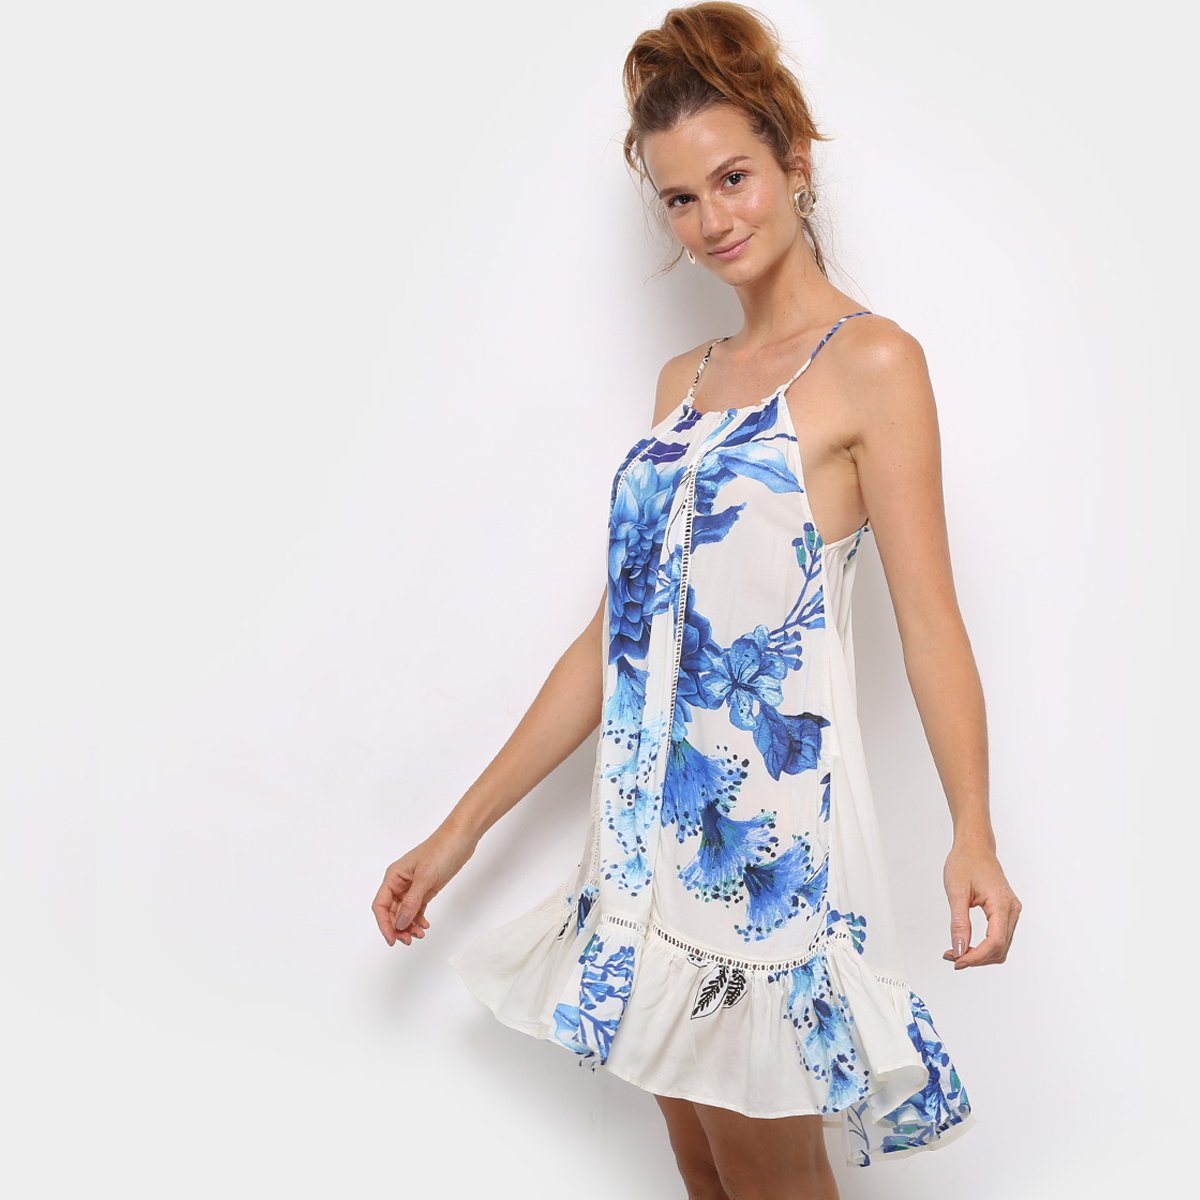 Vestido estampado azul e branco